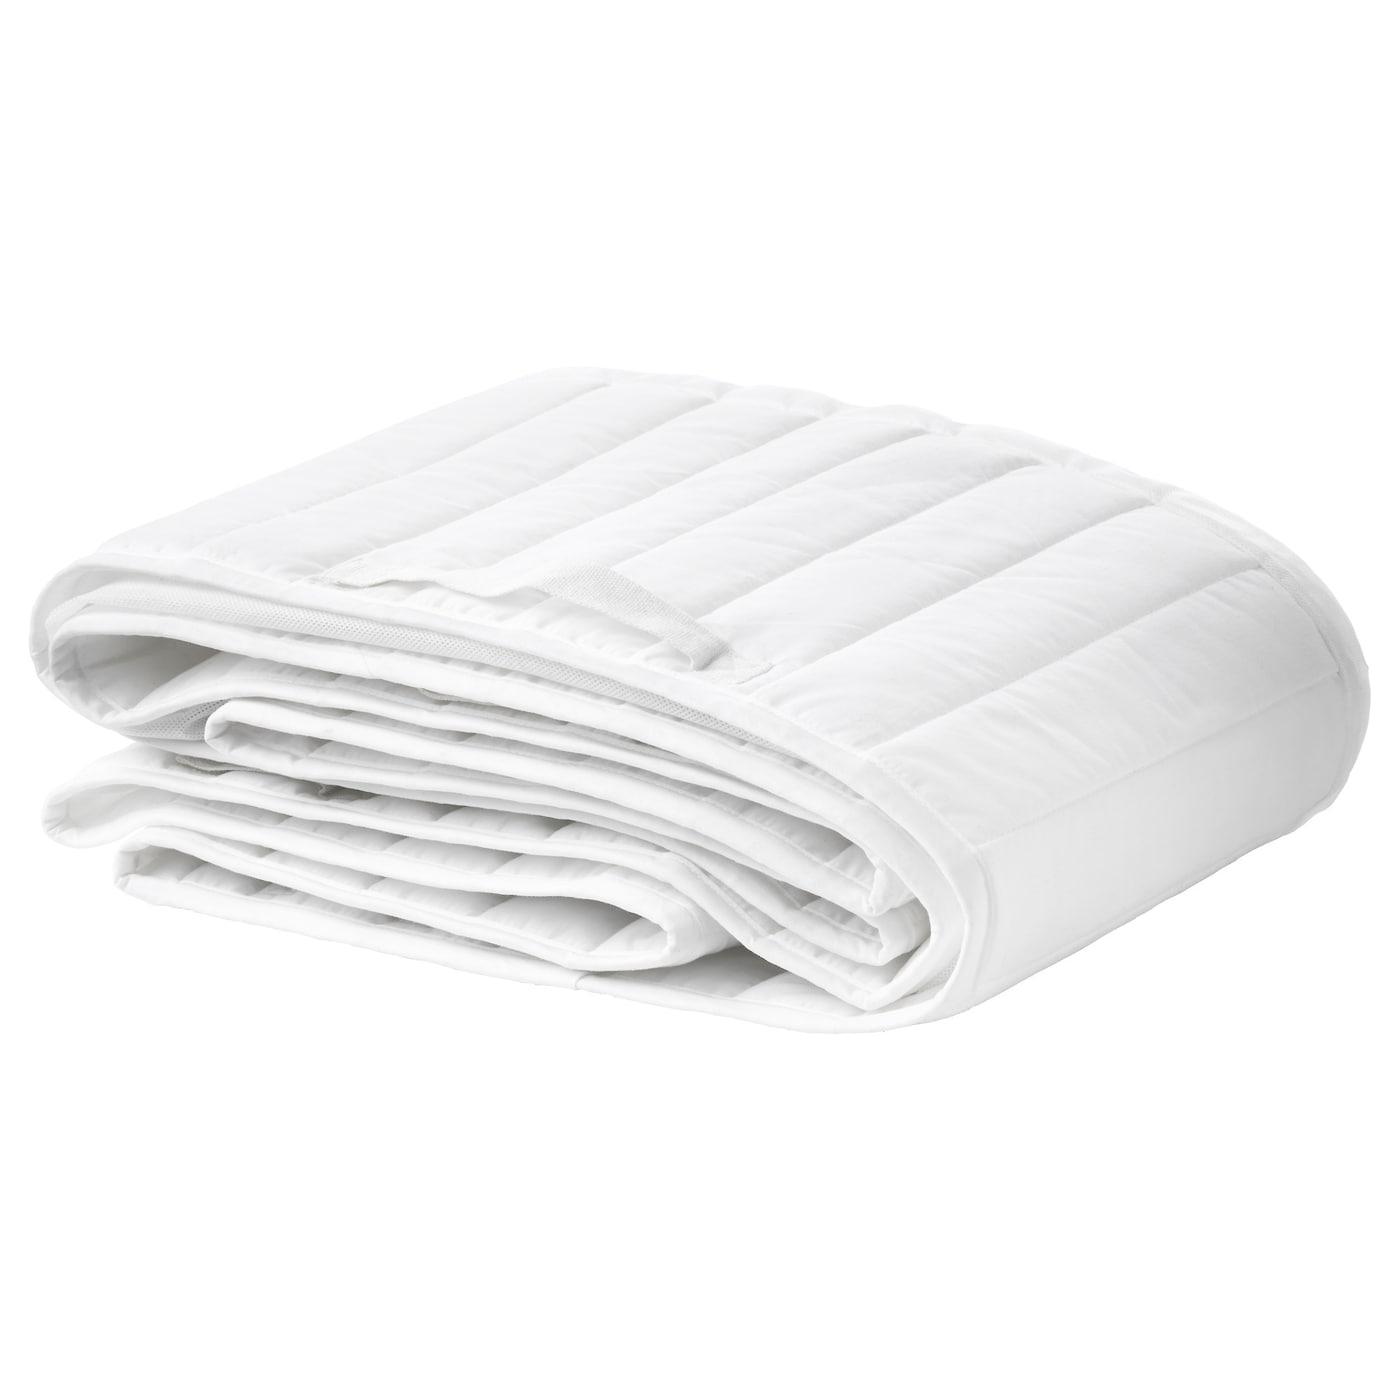 len cot skirt white 70x140 cm ikea. Black Bedroom Furniture Sets. Home Design Ideas